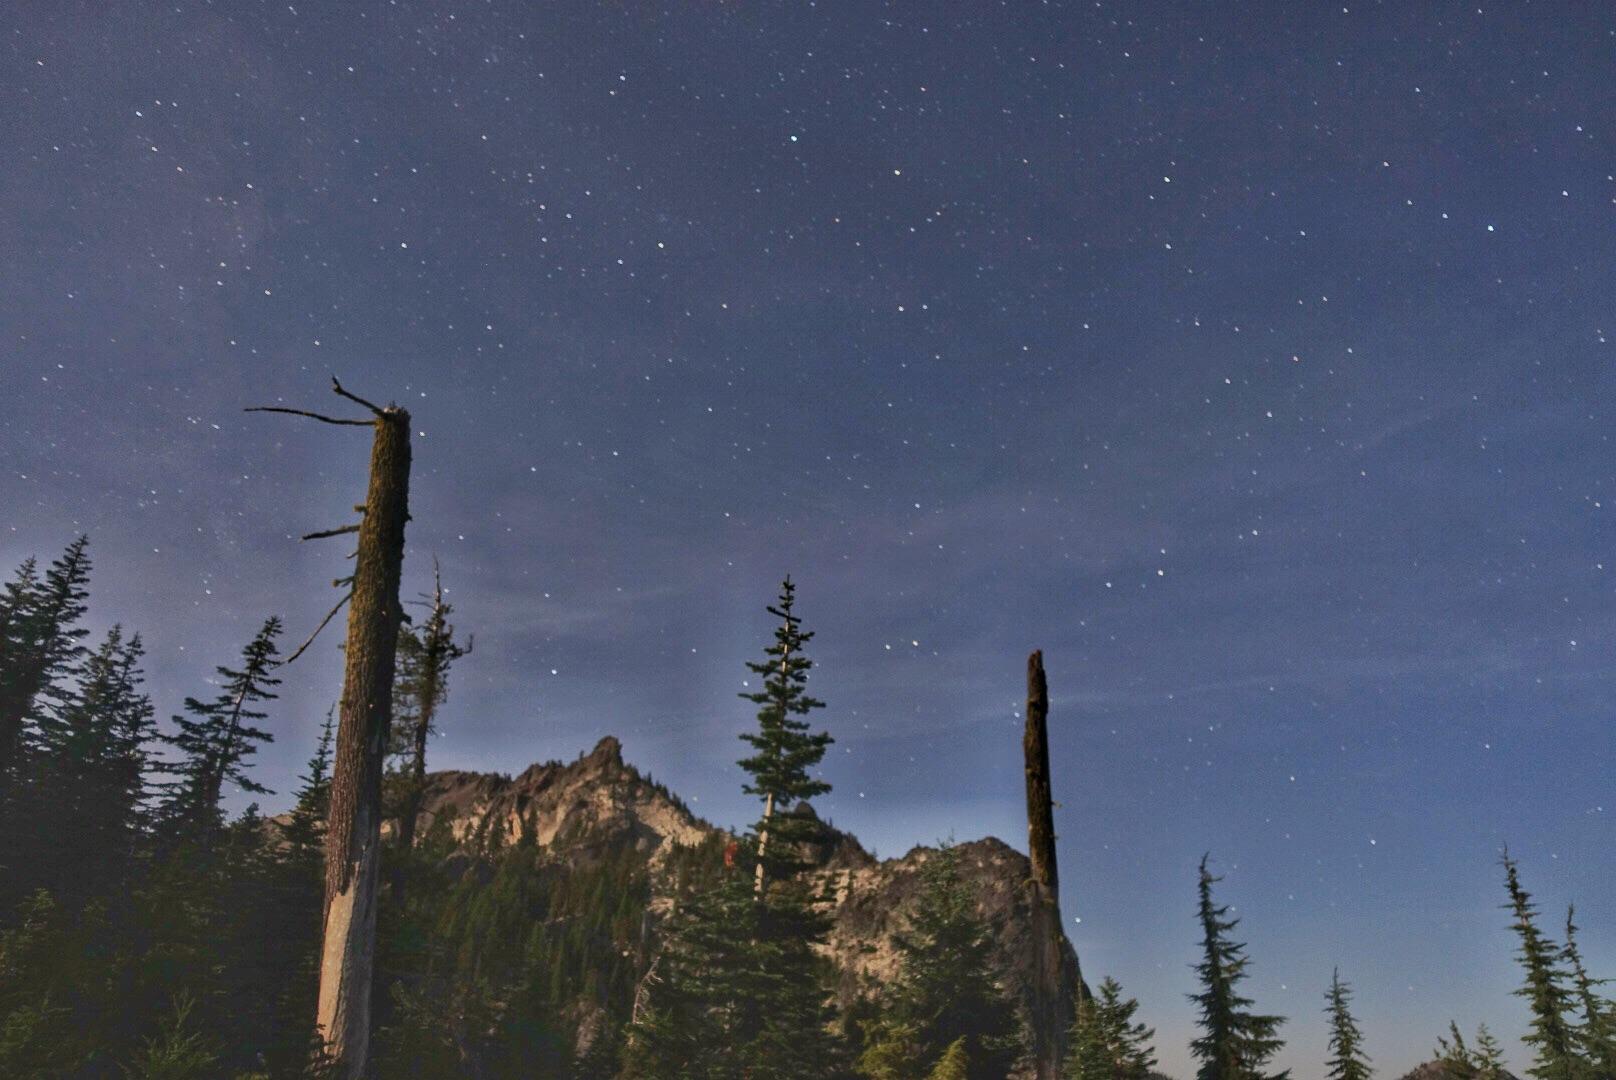 Devils Peak under a starry sky.